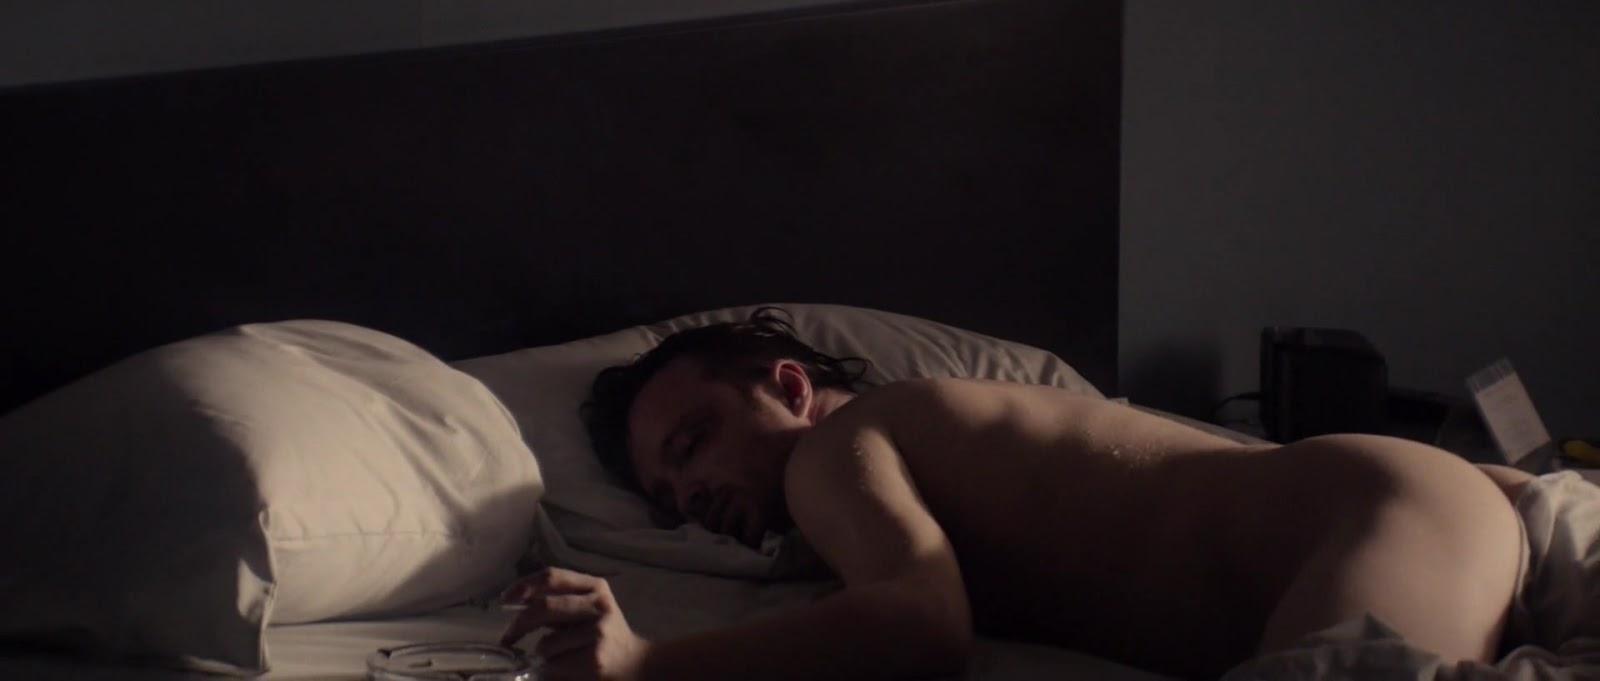 Nude aaron paul Aaron Carter